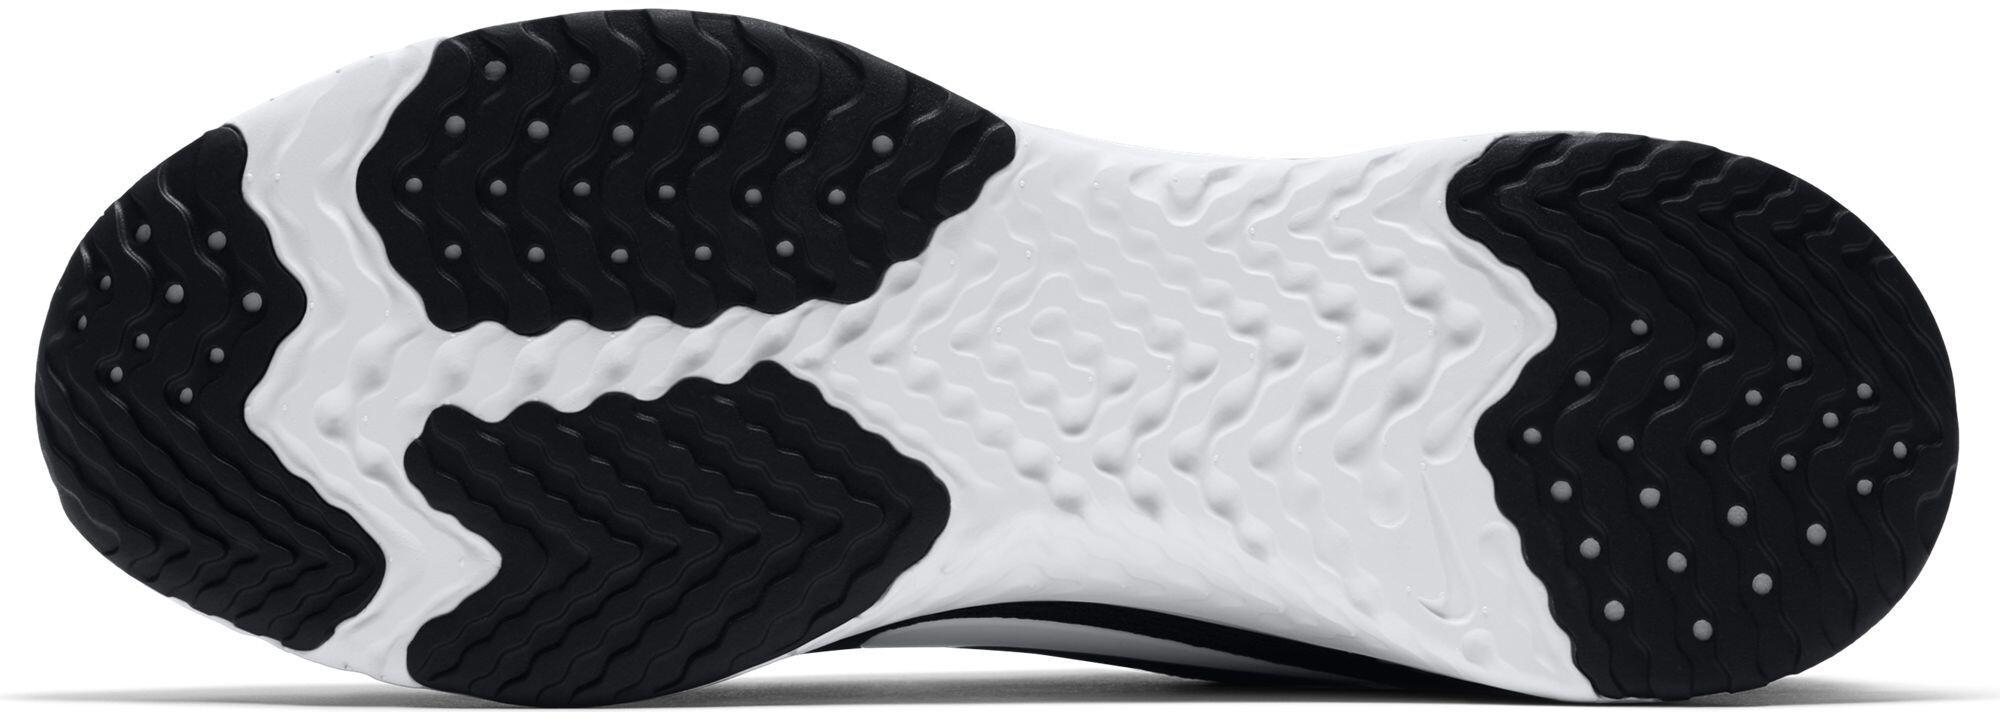 17327f421e0bb Nike Odyssey React - Zapatillas running Hombre - negro